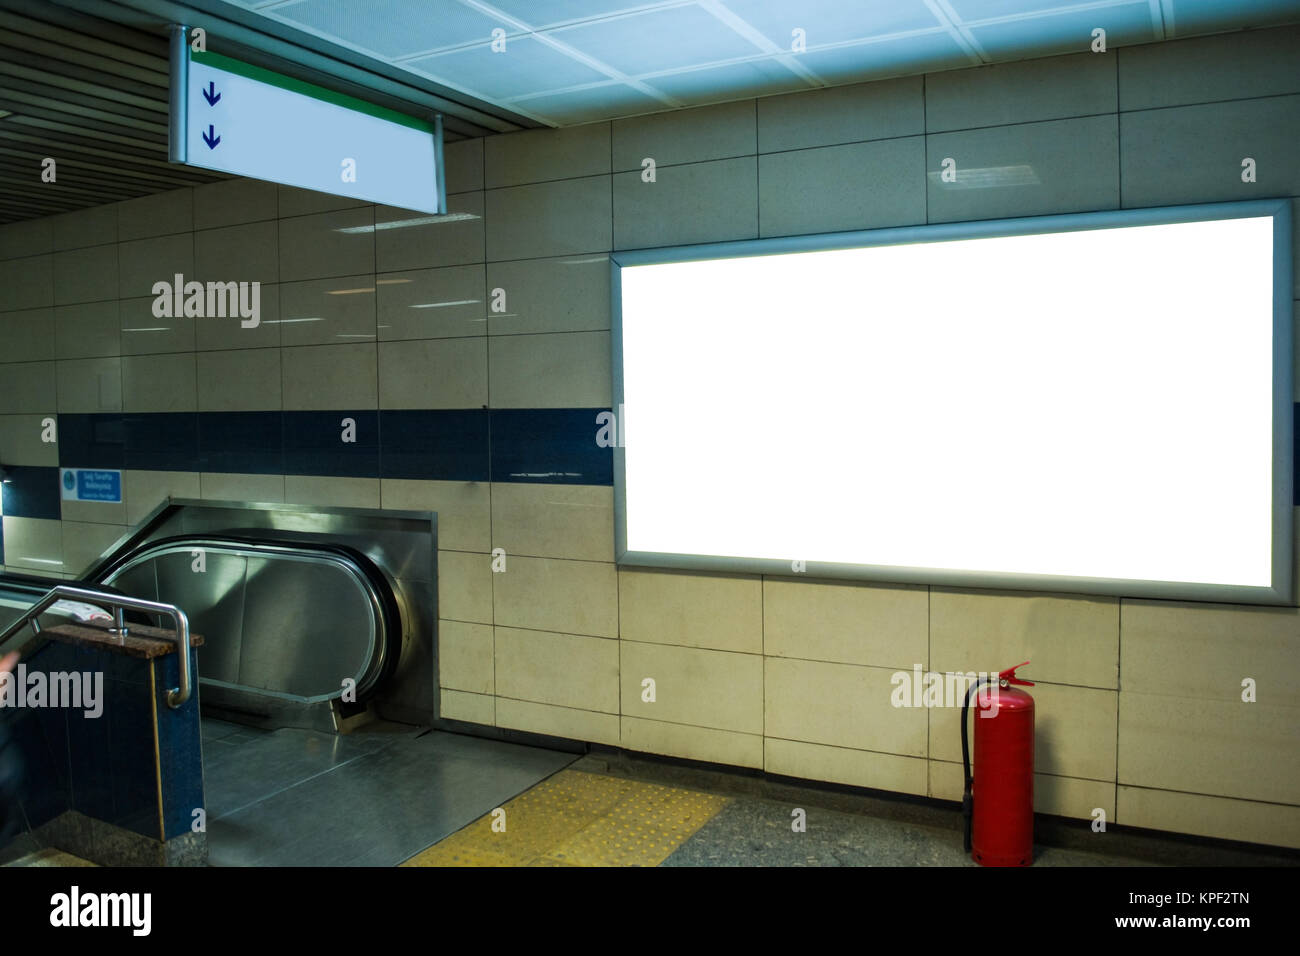 blank horizontal big poster in public place billboard mockup near to escalator in subway - Stock Image